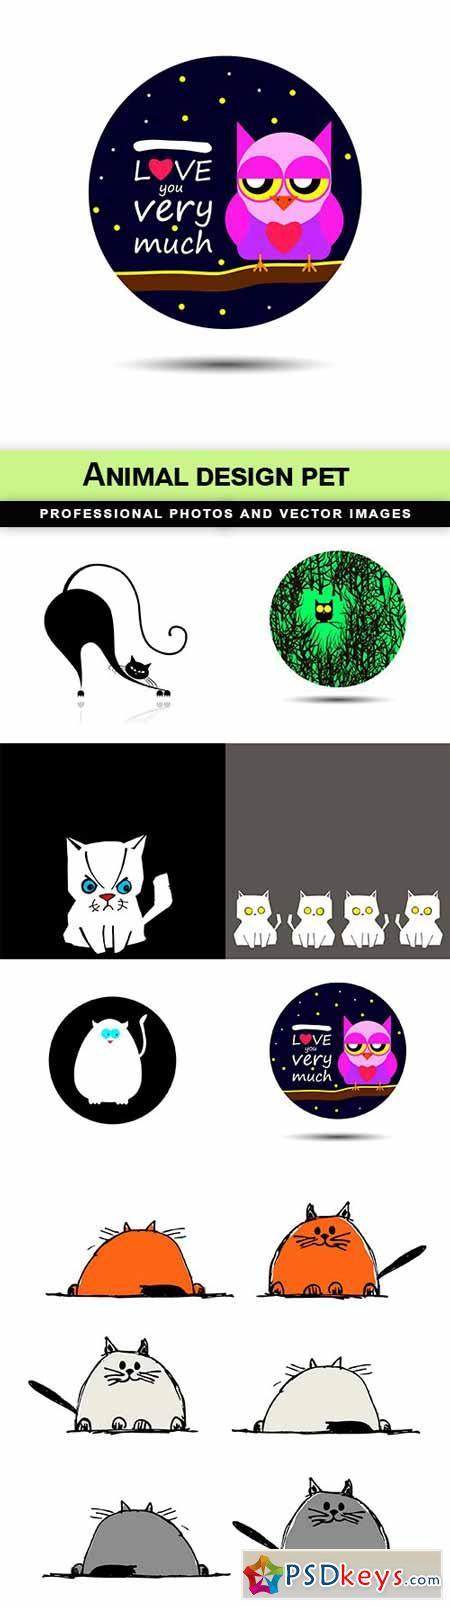 Animal design pet - 7 EPS